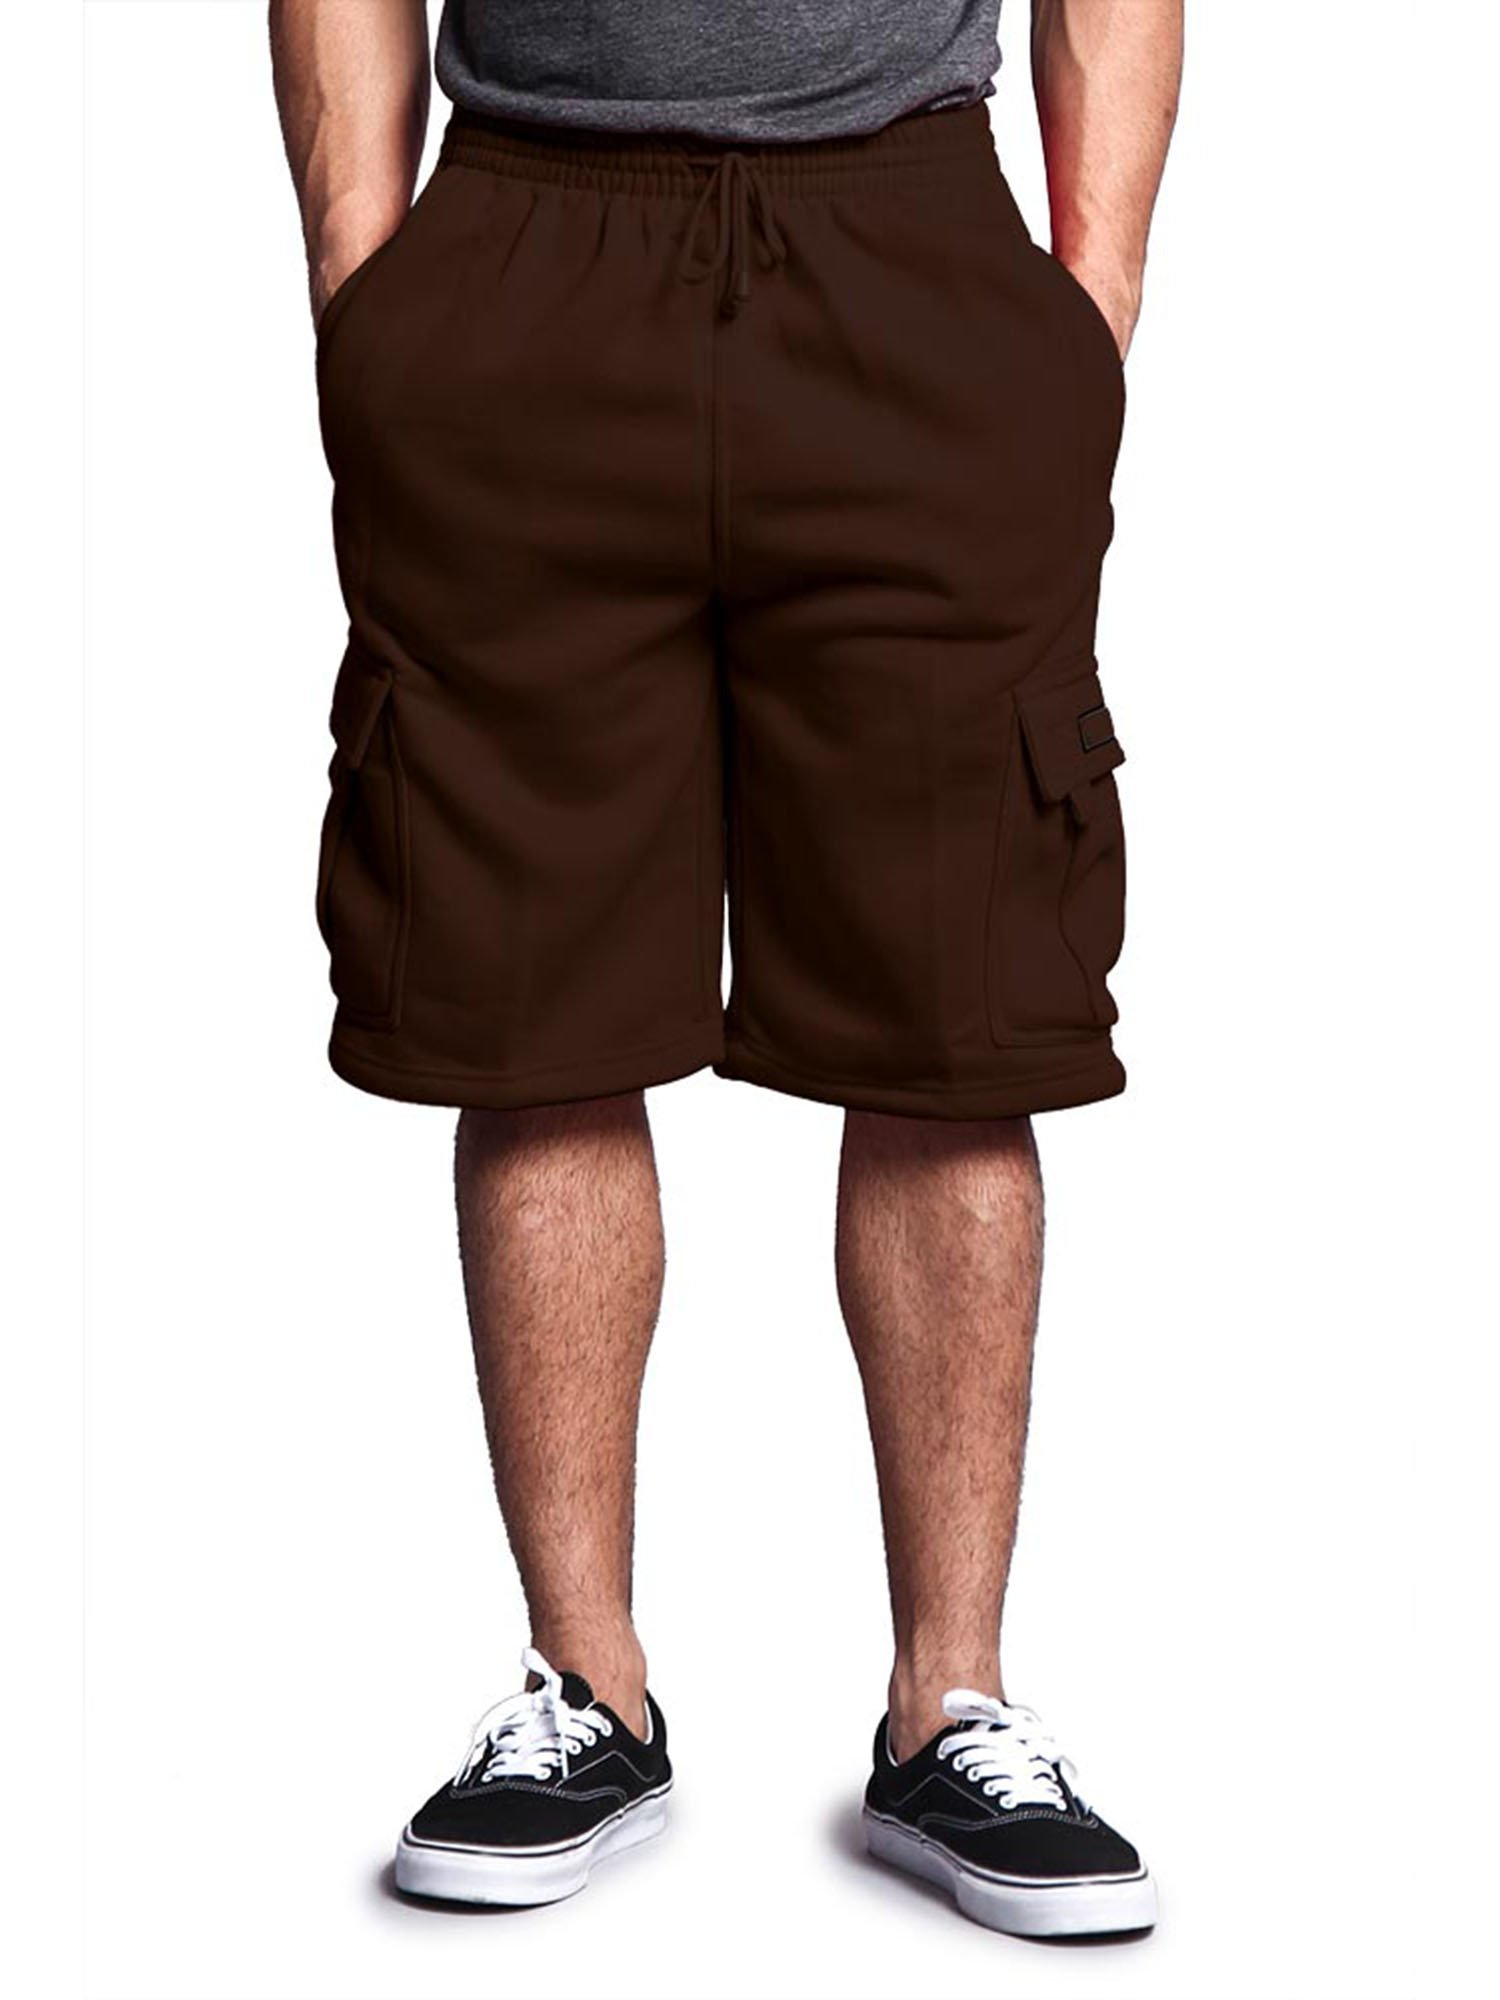 G-Style USA Men's Solid Fleece Cargo Shorts DFP1 - Charcoal - Medium